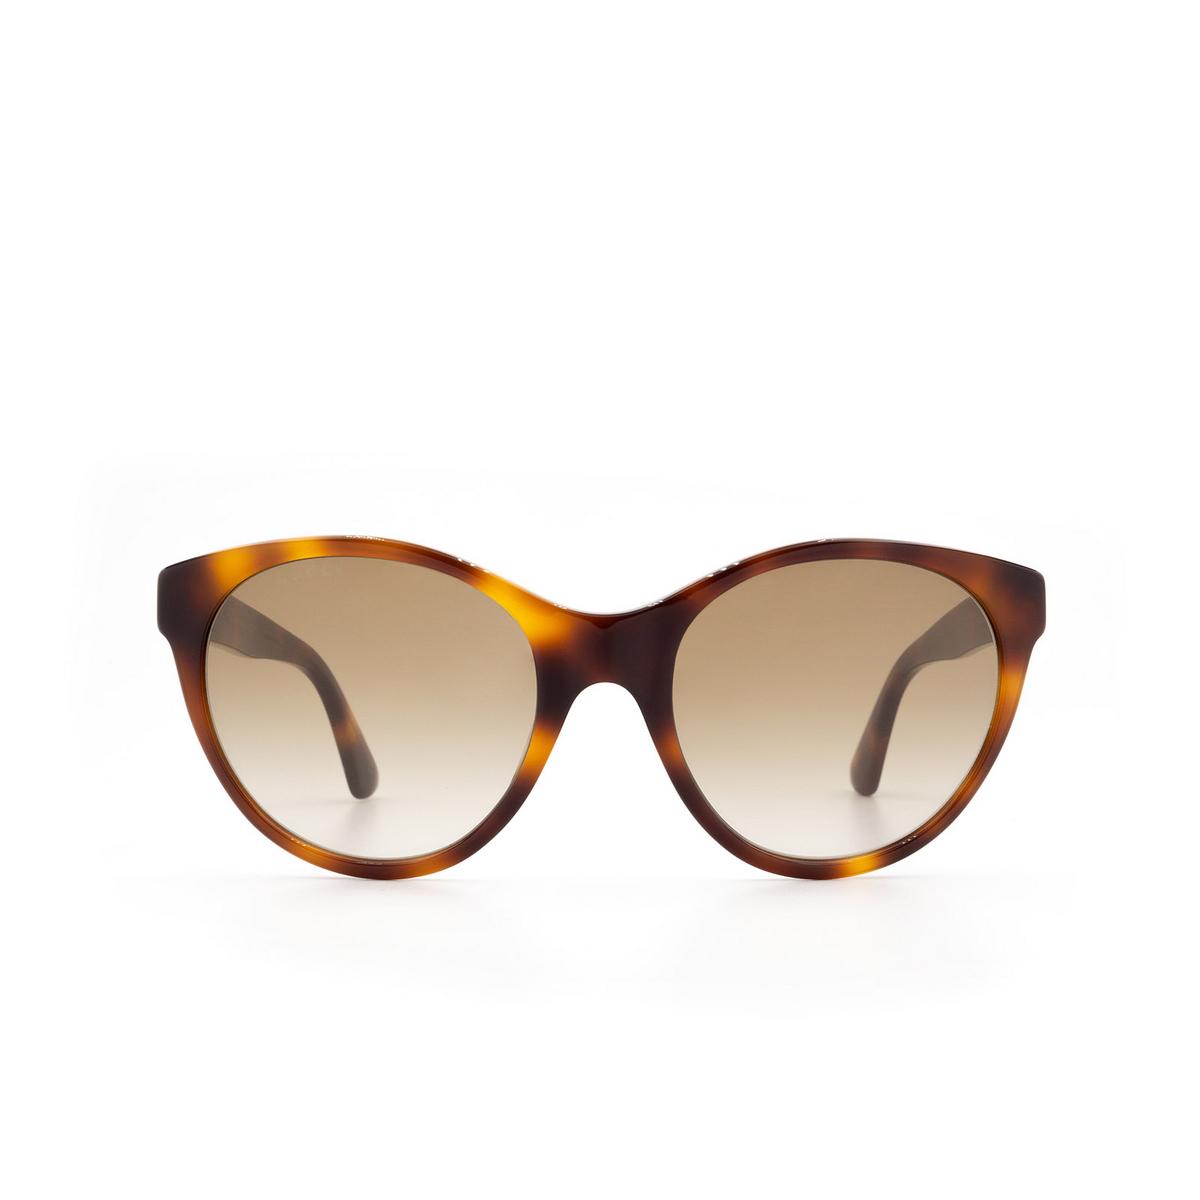 Gucci® Cat-eye Sunglasses: GG0419S color Havana 003 - 1/3.